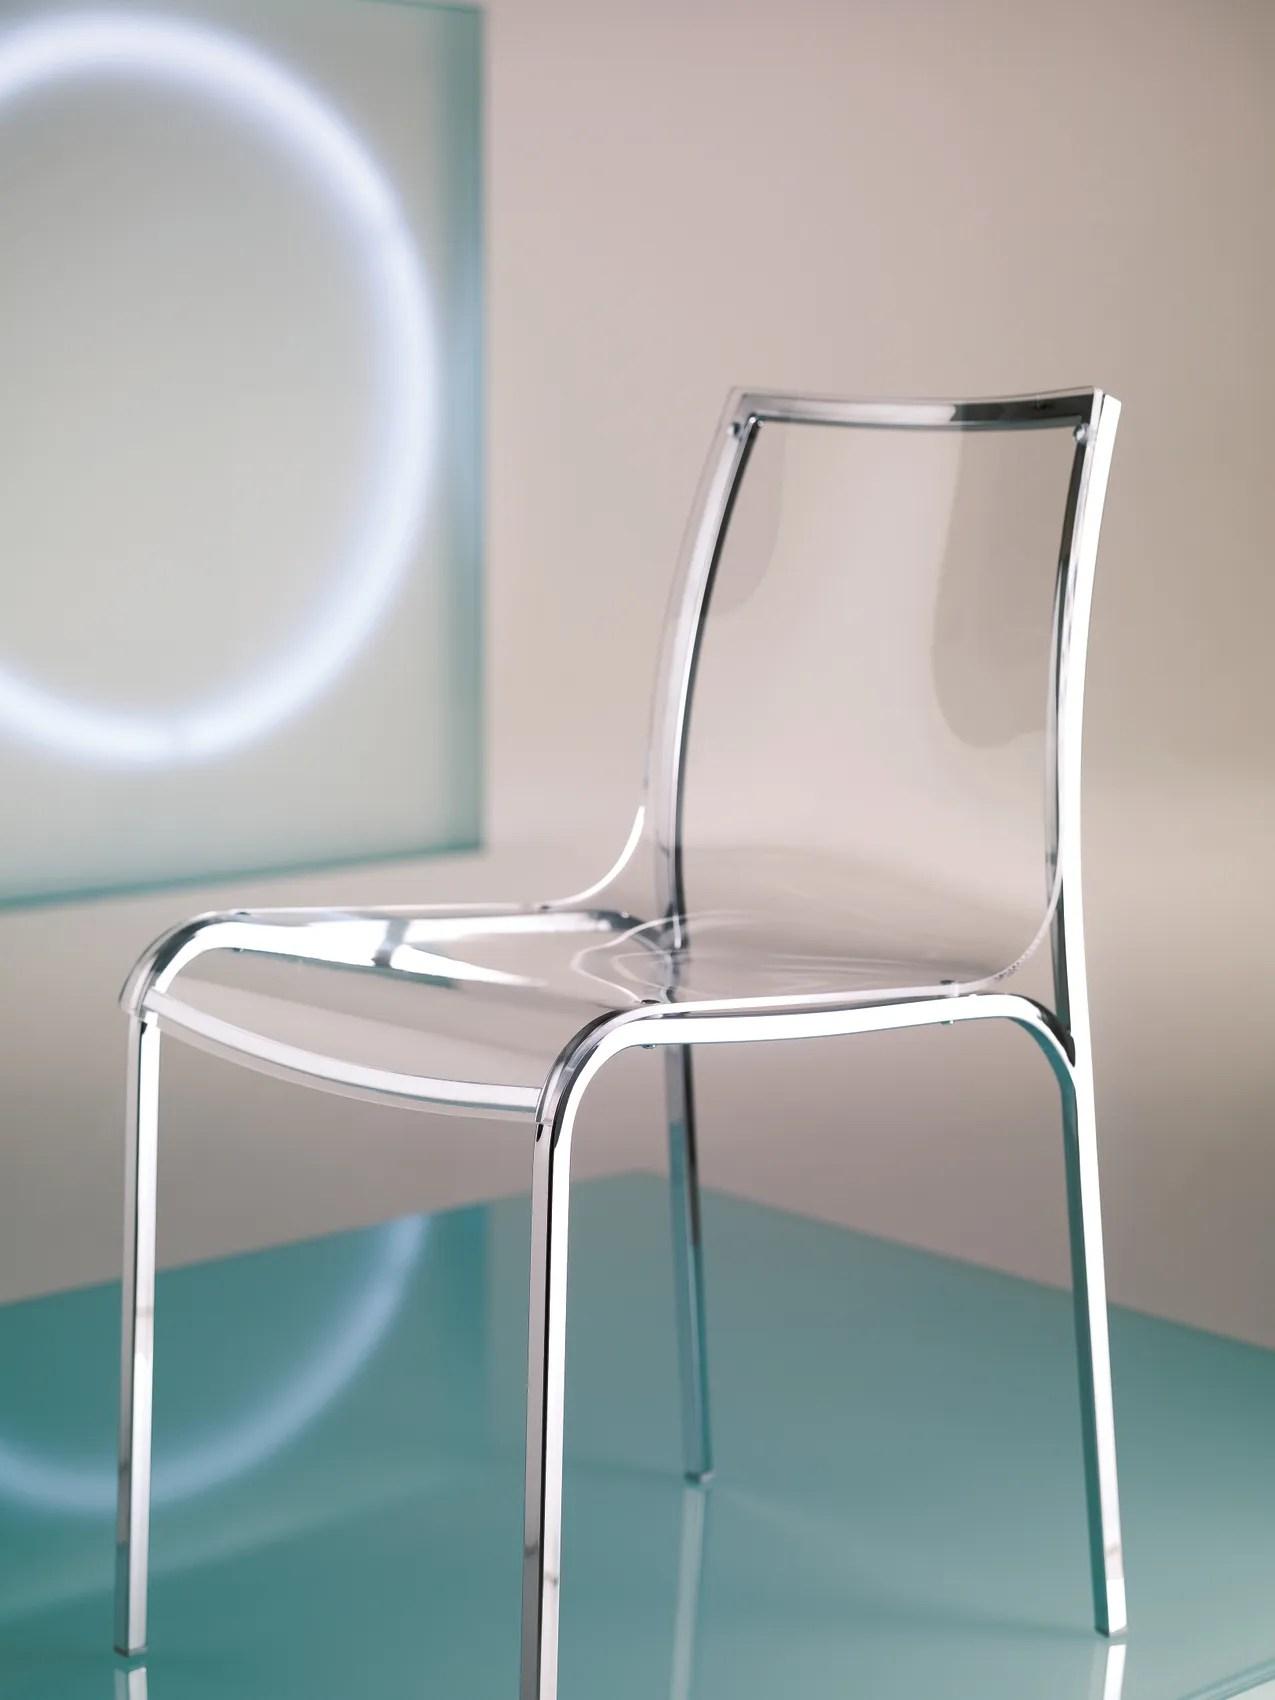 Sedia in vetro acrilico YOGA By Bontempi